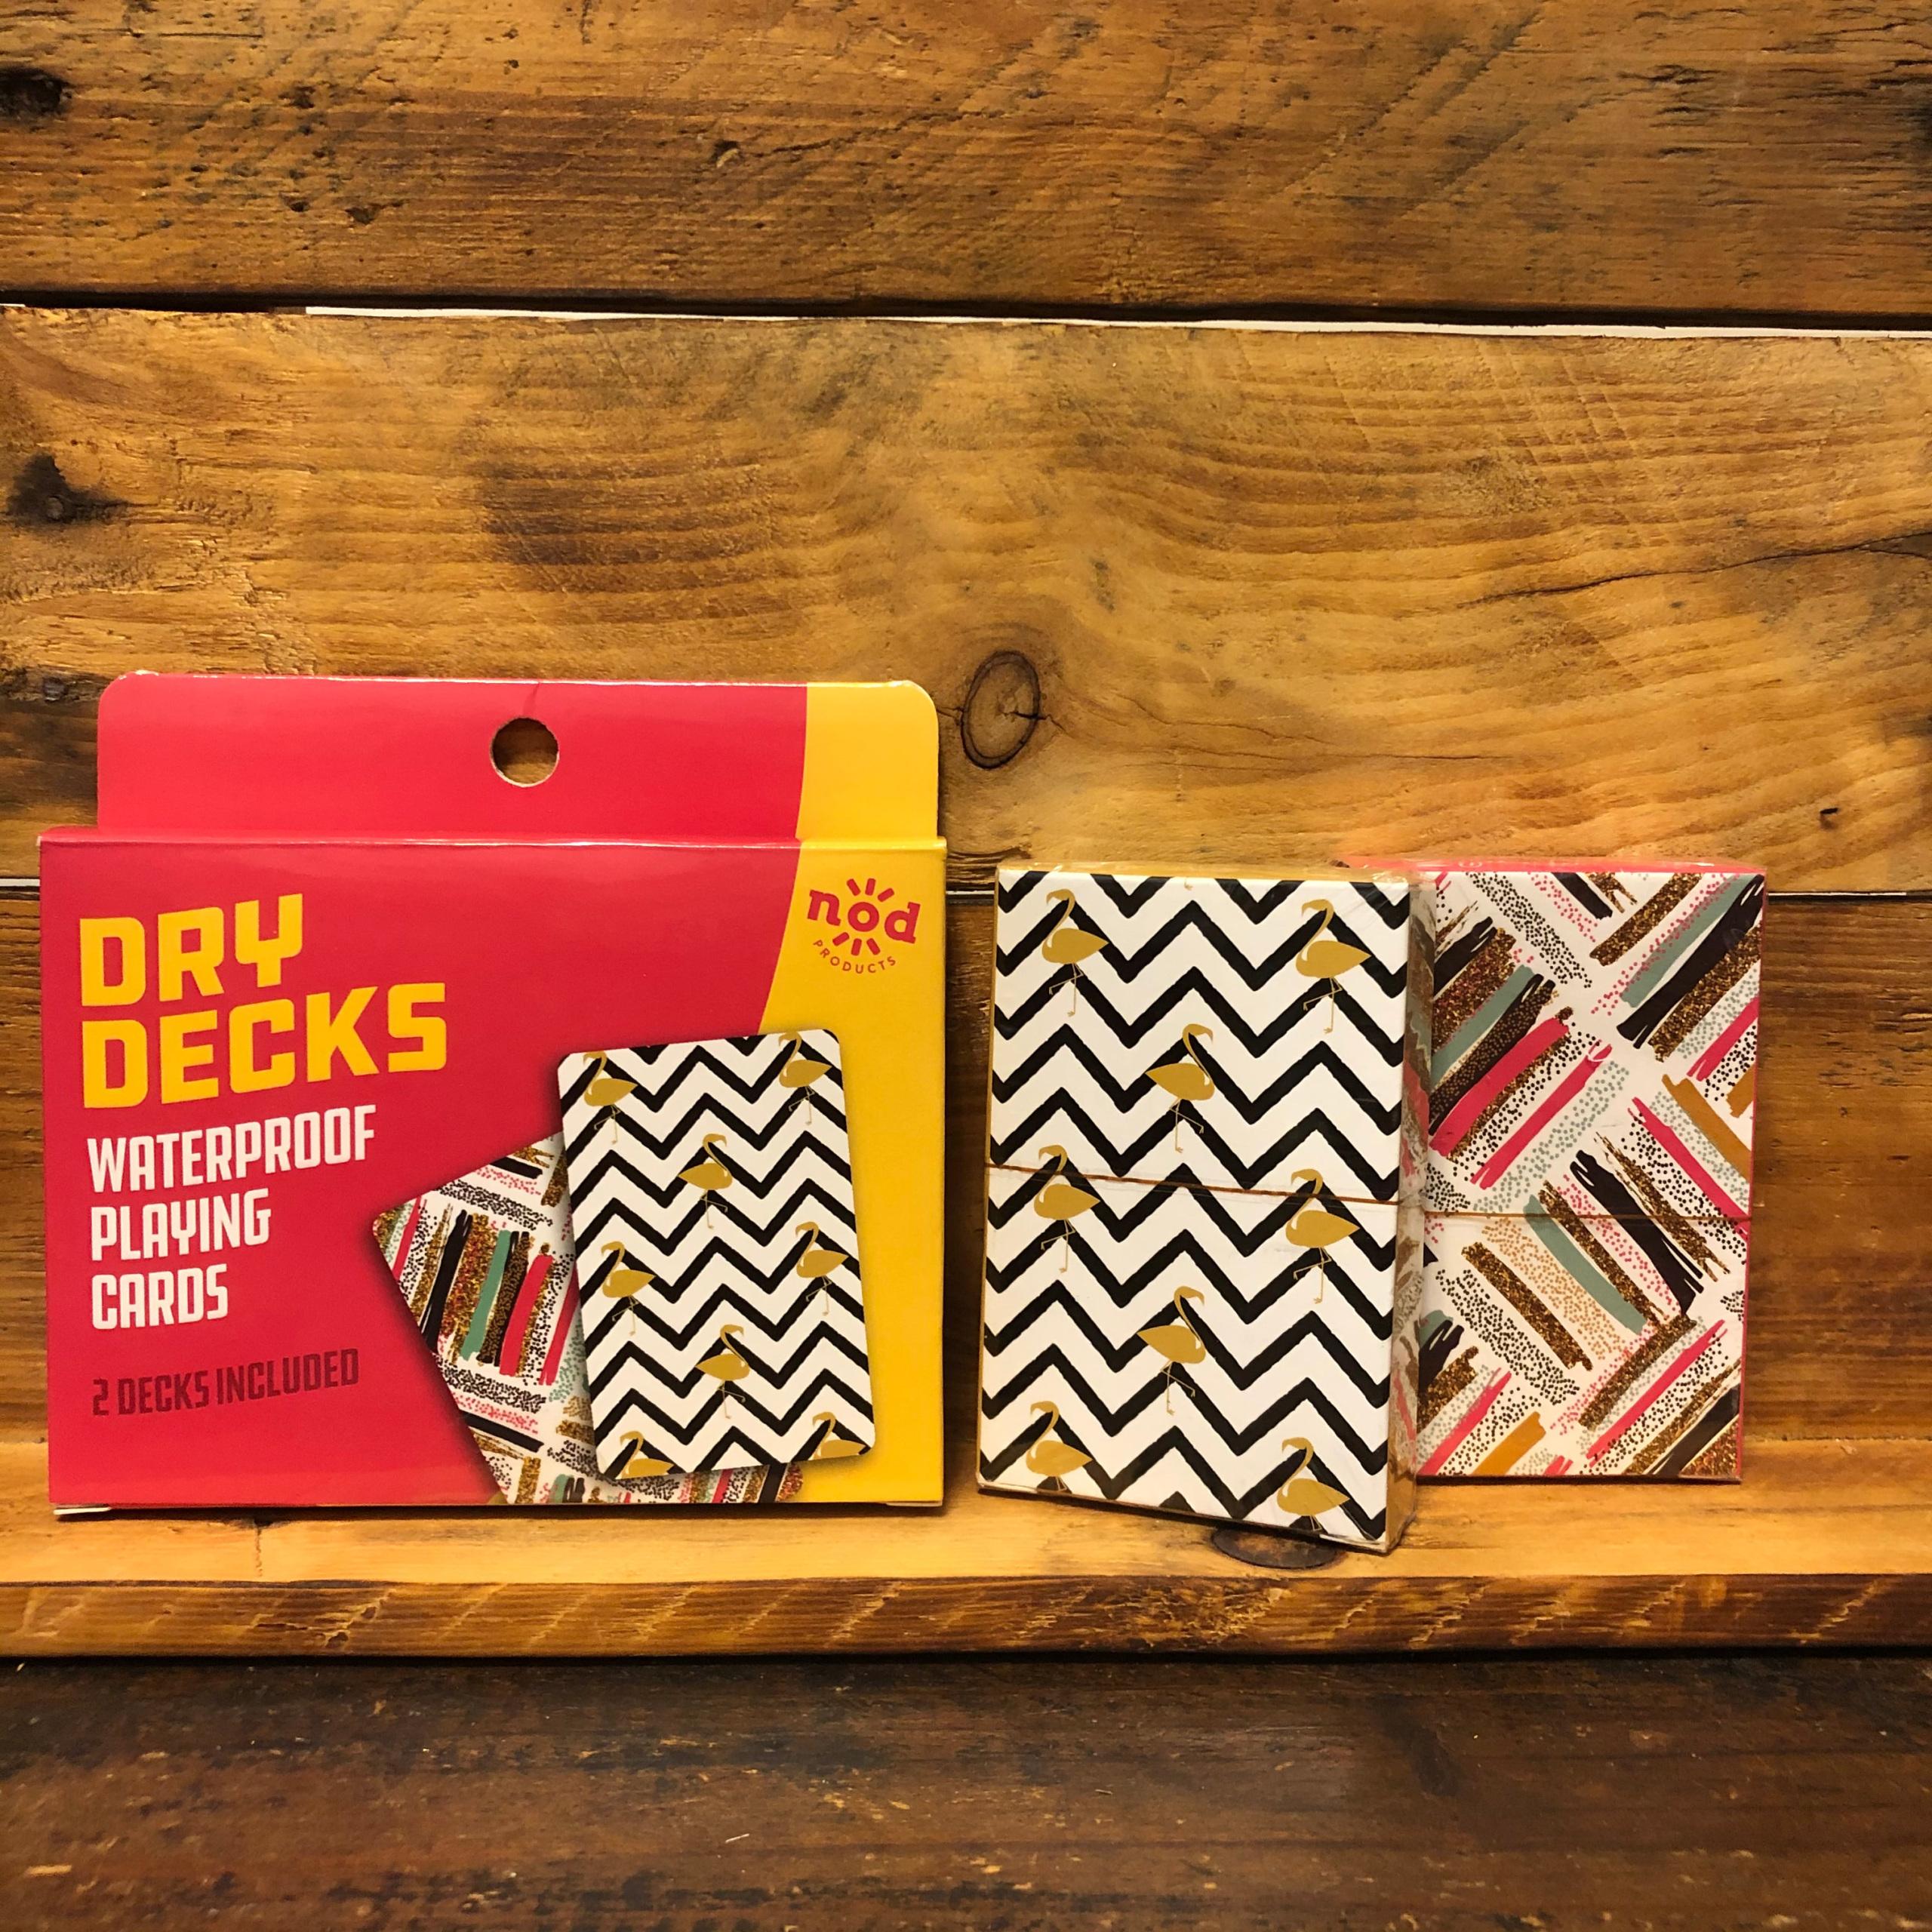 Dry Decks Waterproof Playing Cards Flamingo/Miami Vice